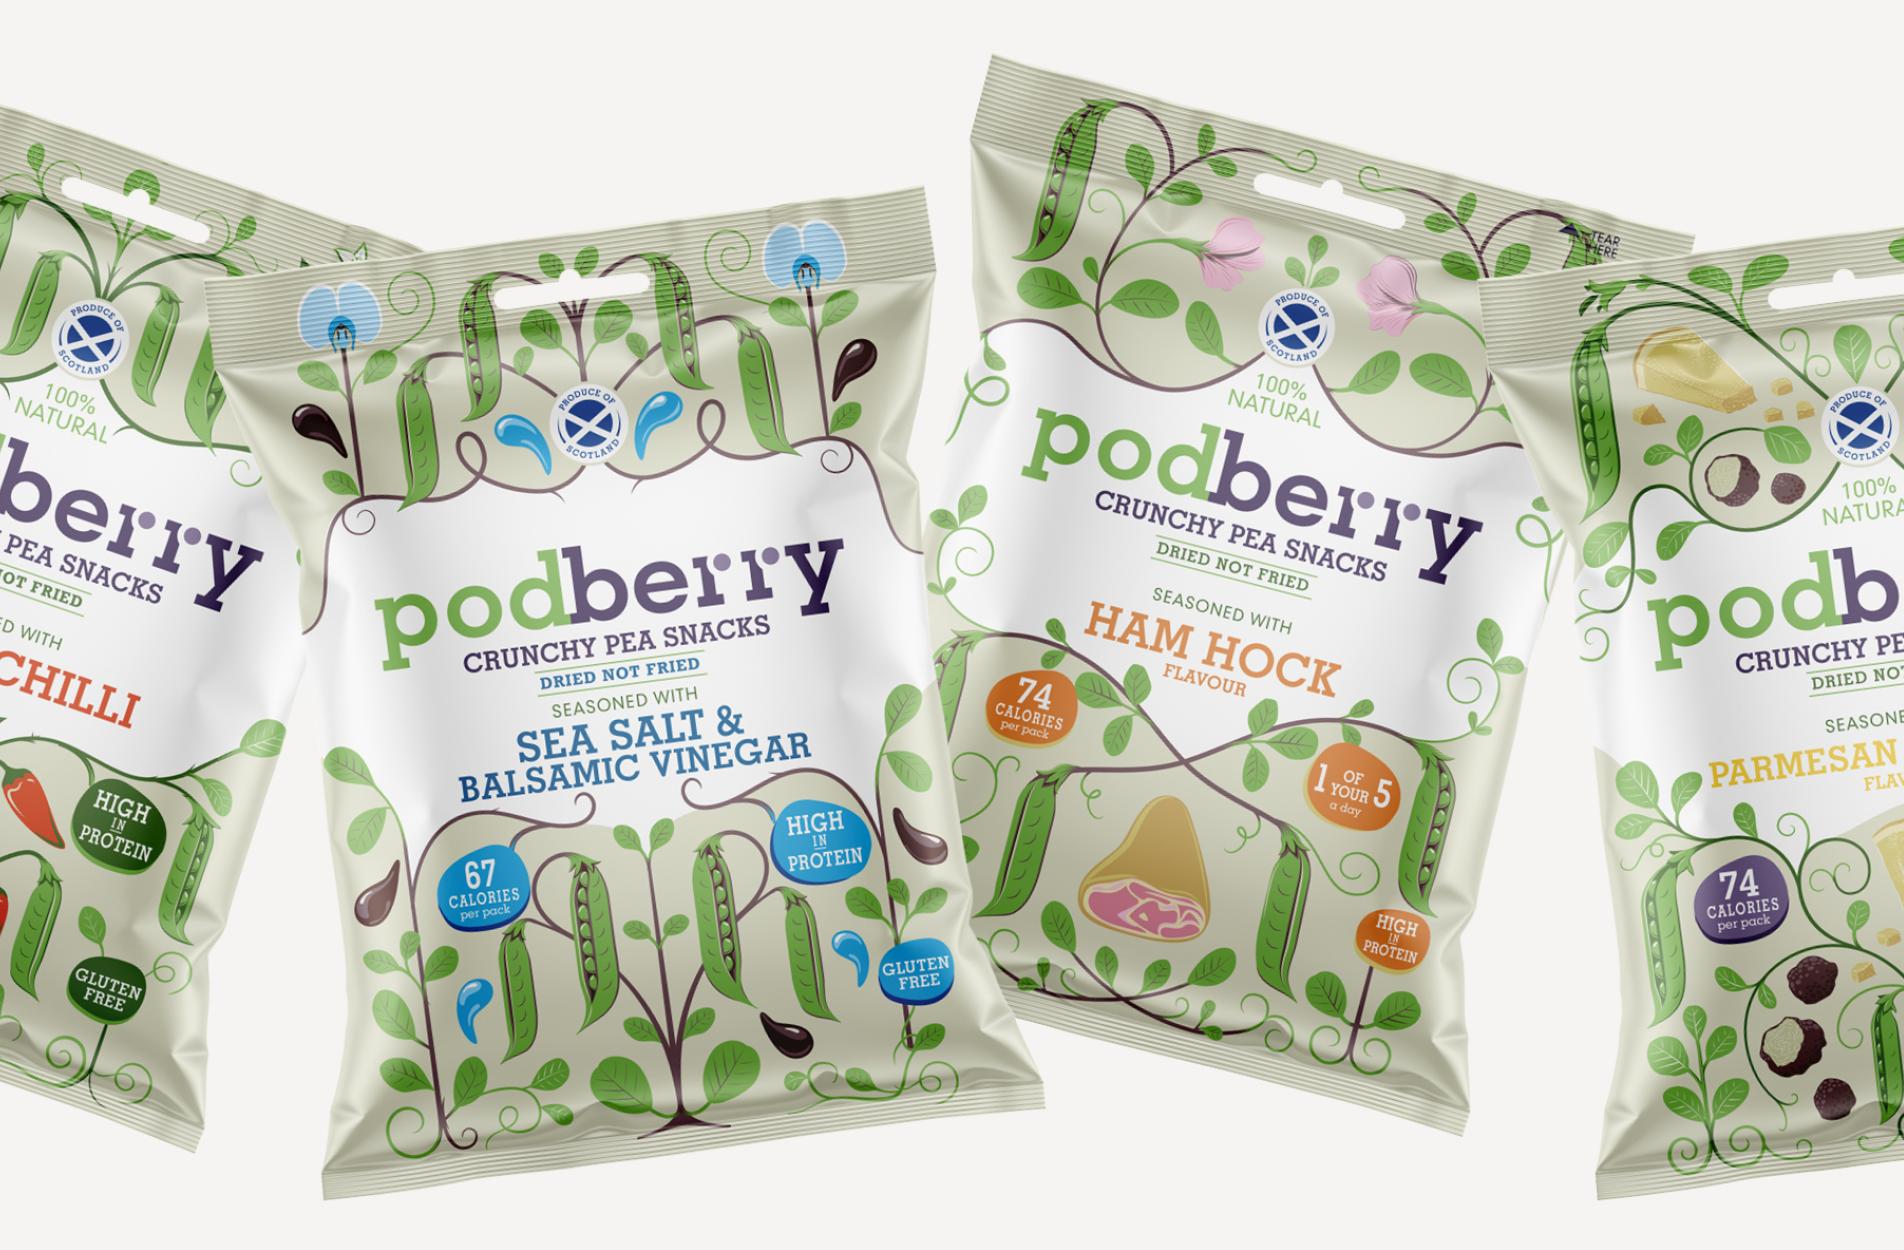 Podberry - Bruce Farms